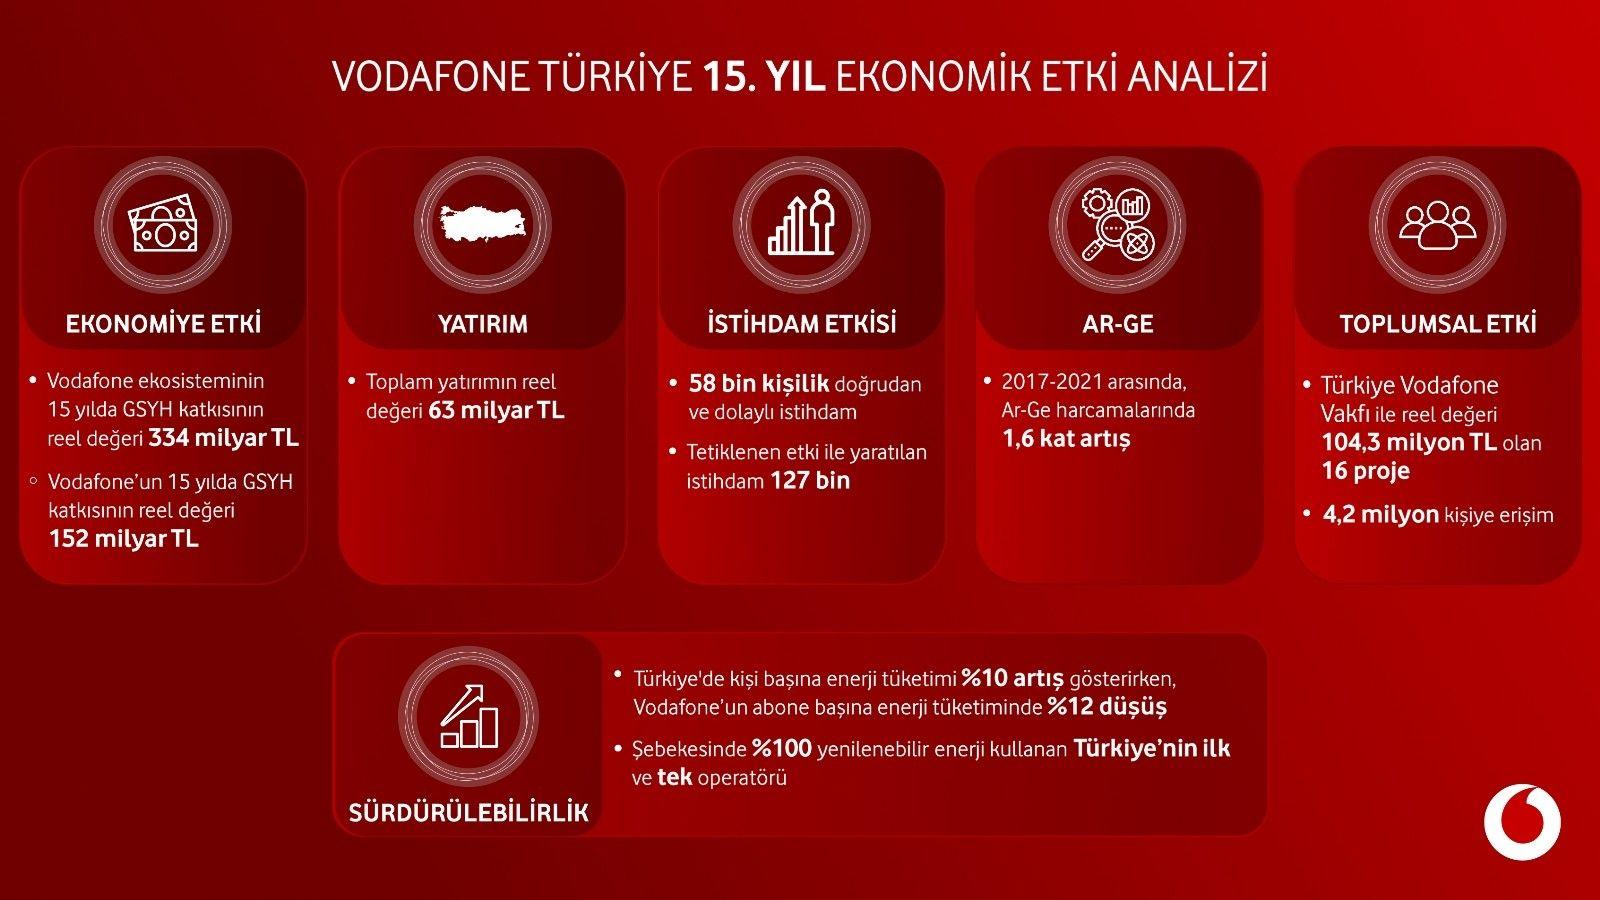 2021/09/buyuyen-turkiyenin-operatoru-olmaya-odaklandi-20210917AW41-1.jpg